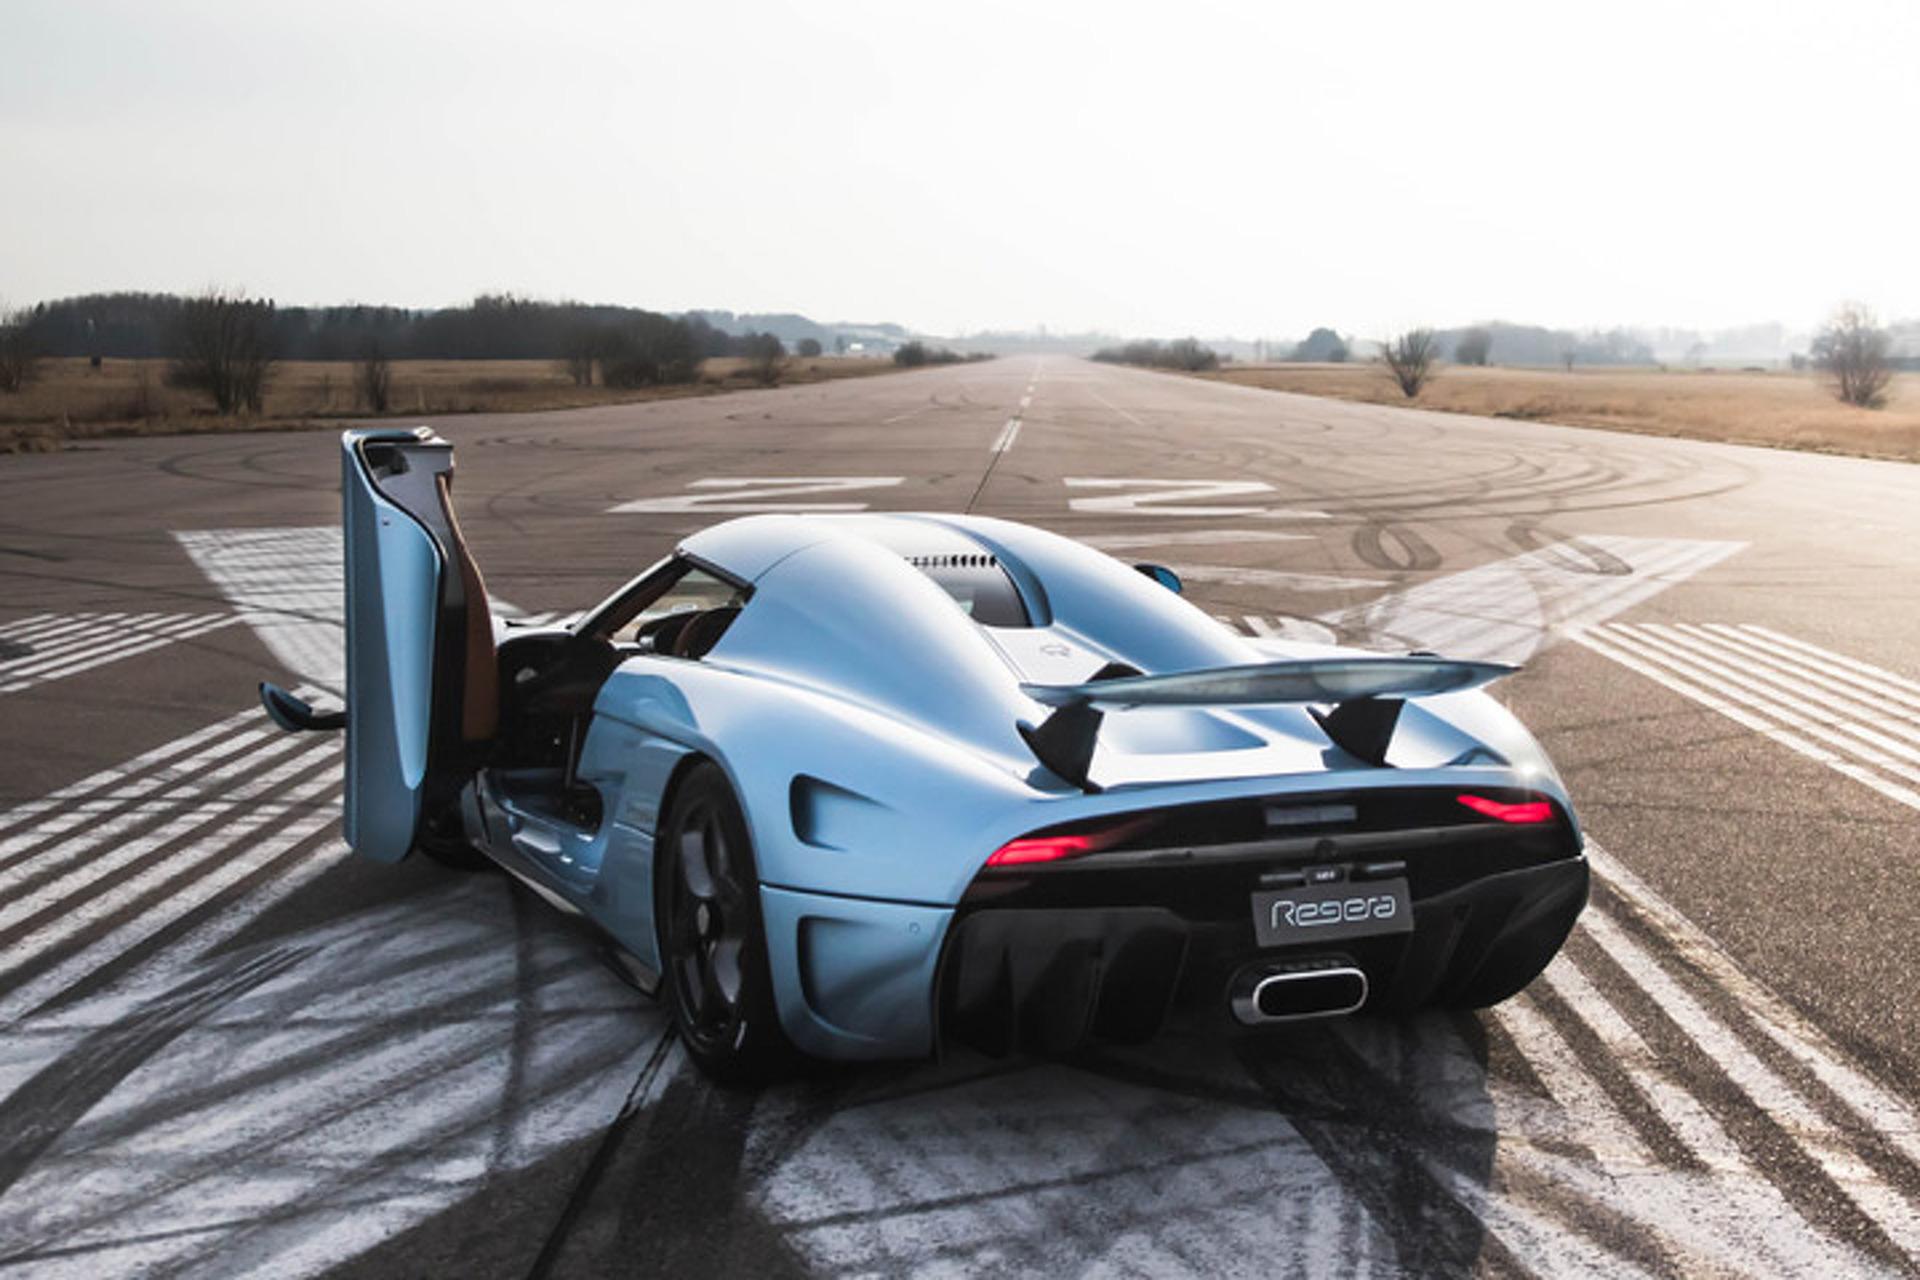 The 1,500HP Koenigsegg Regera Hypercar Gets a $2.3 Million Price Tag